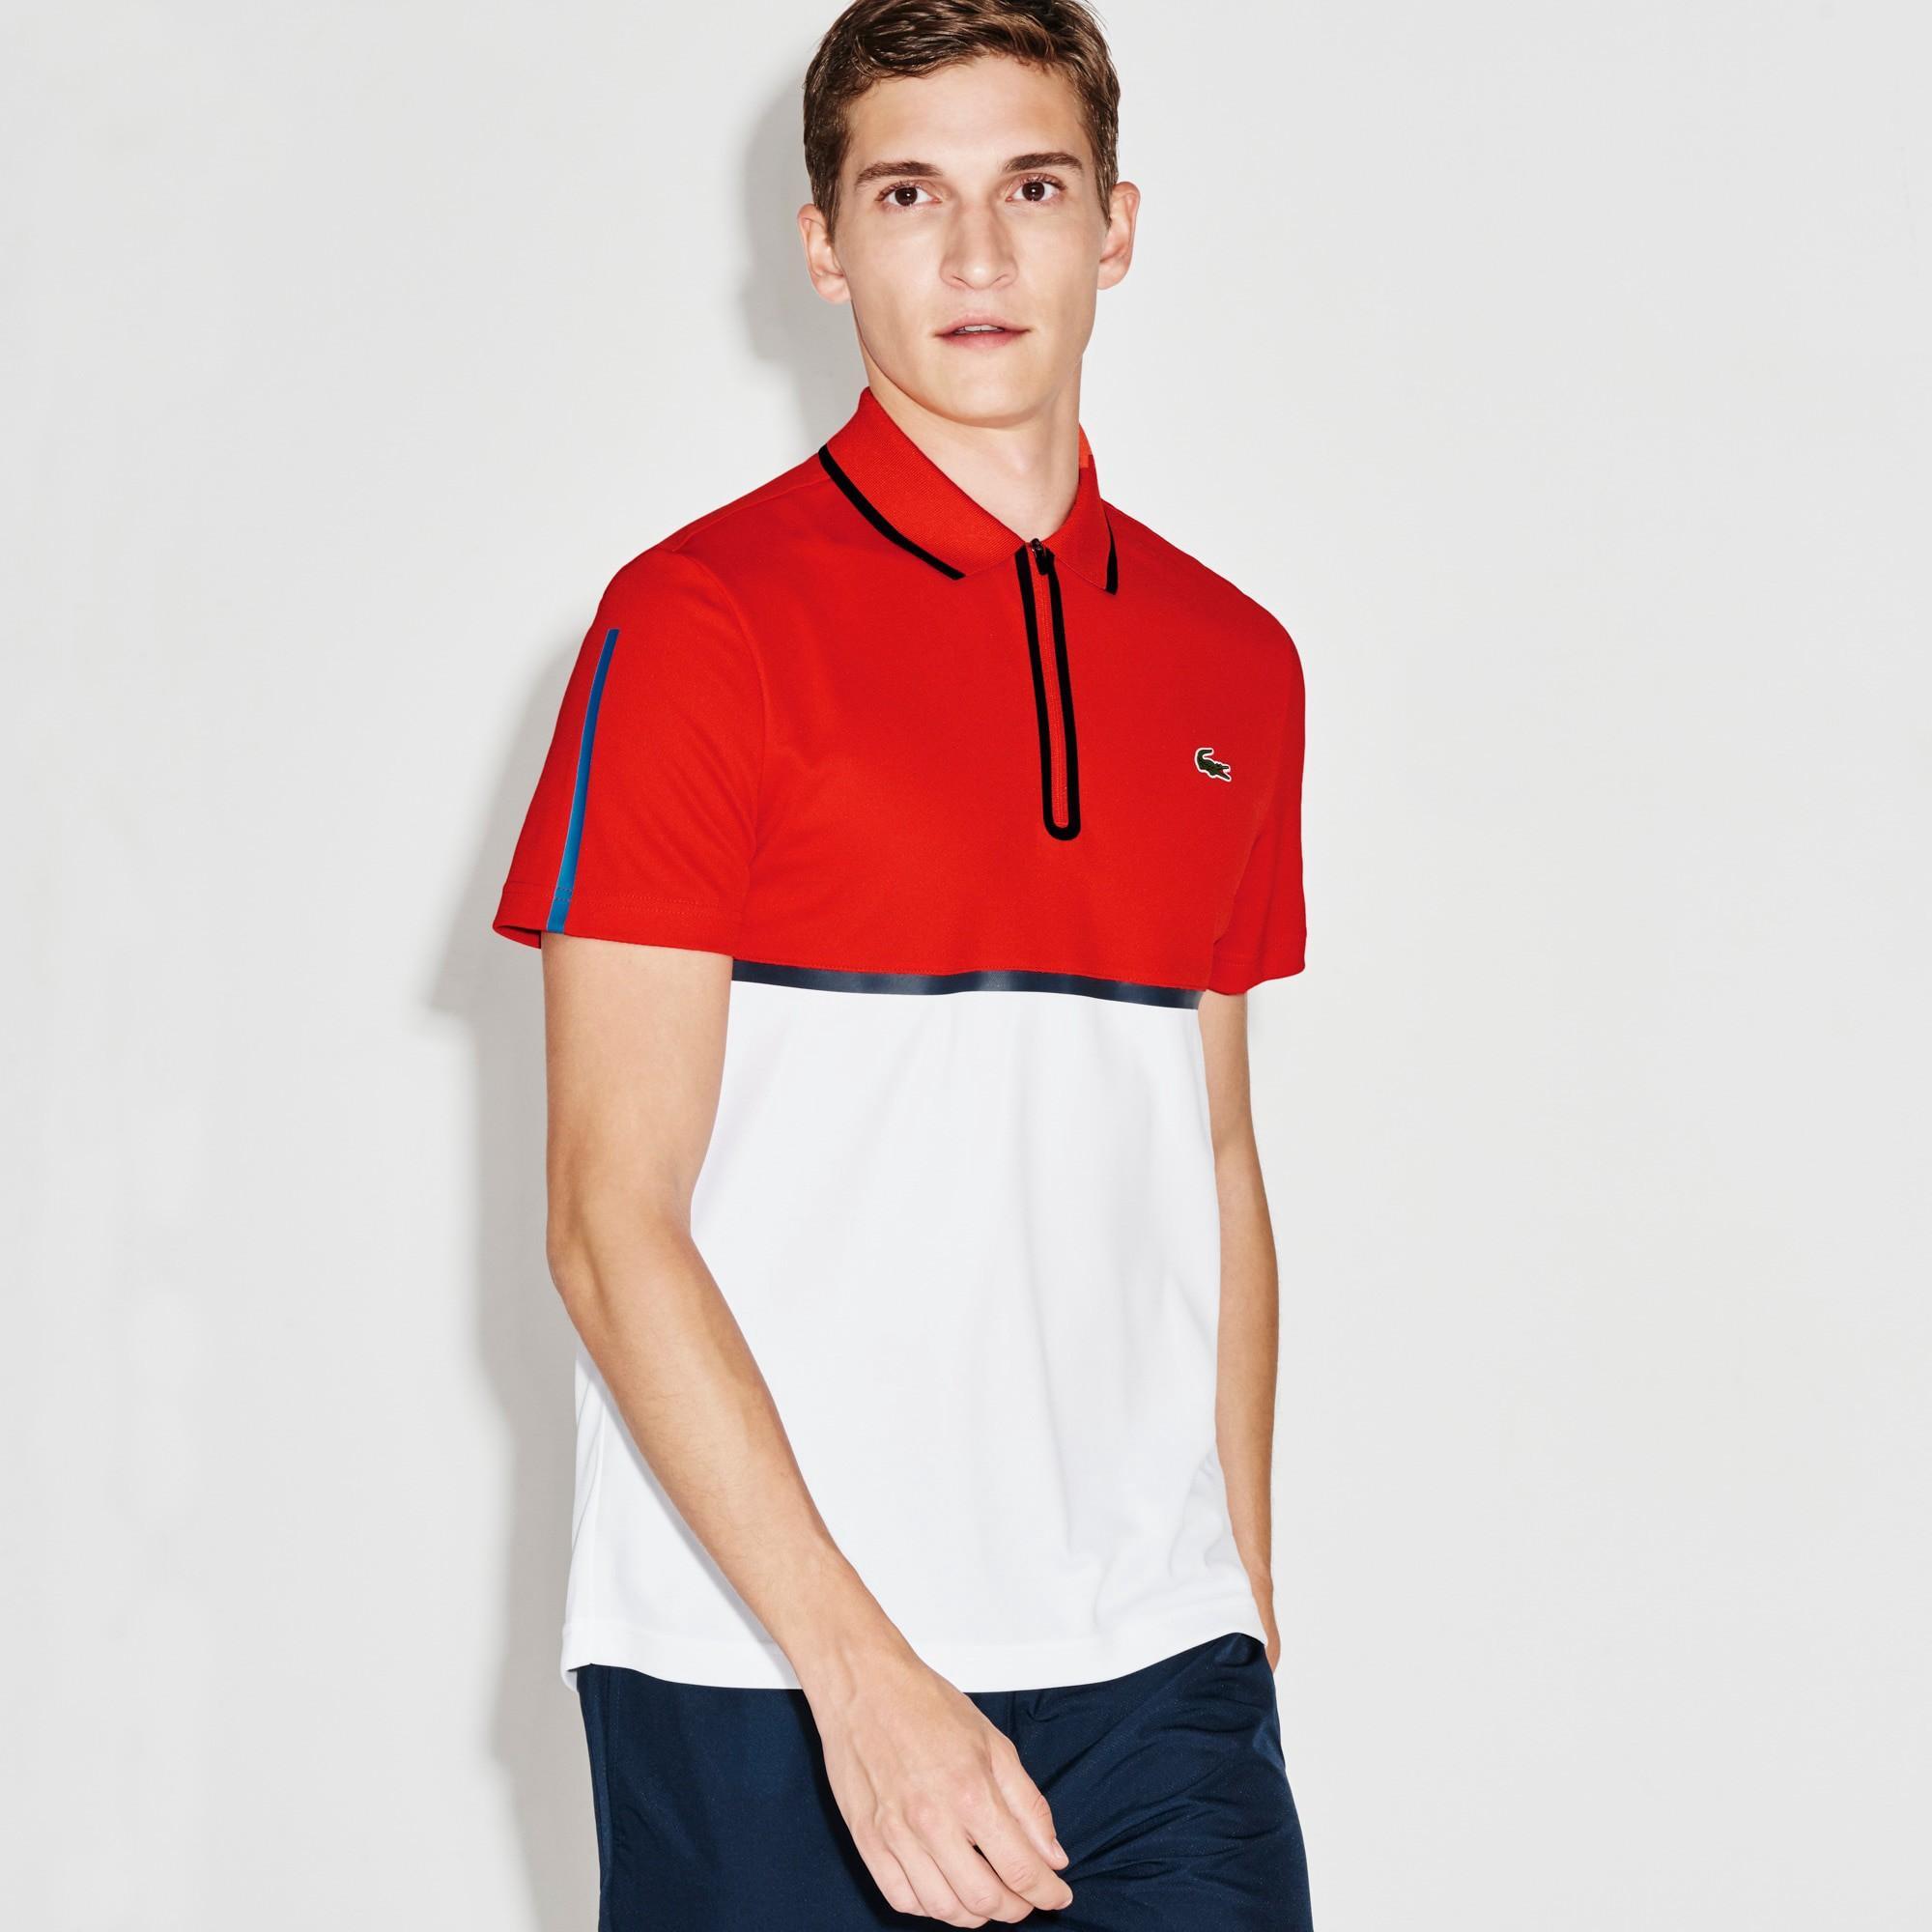 77dc8ed7 Lacoste Men's Sport Ultra Dry Zip Pique Knit Tennis Polo Shirt - Etna  Red/White